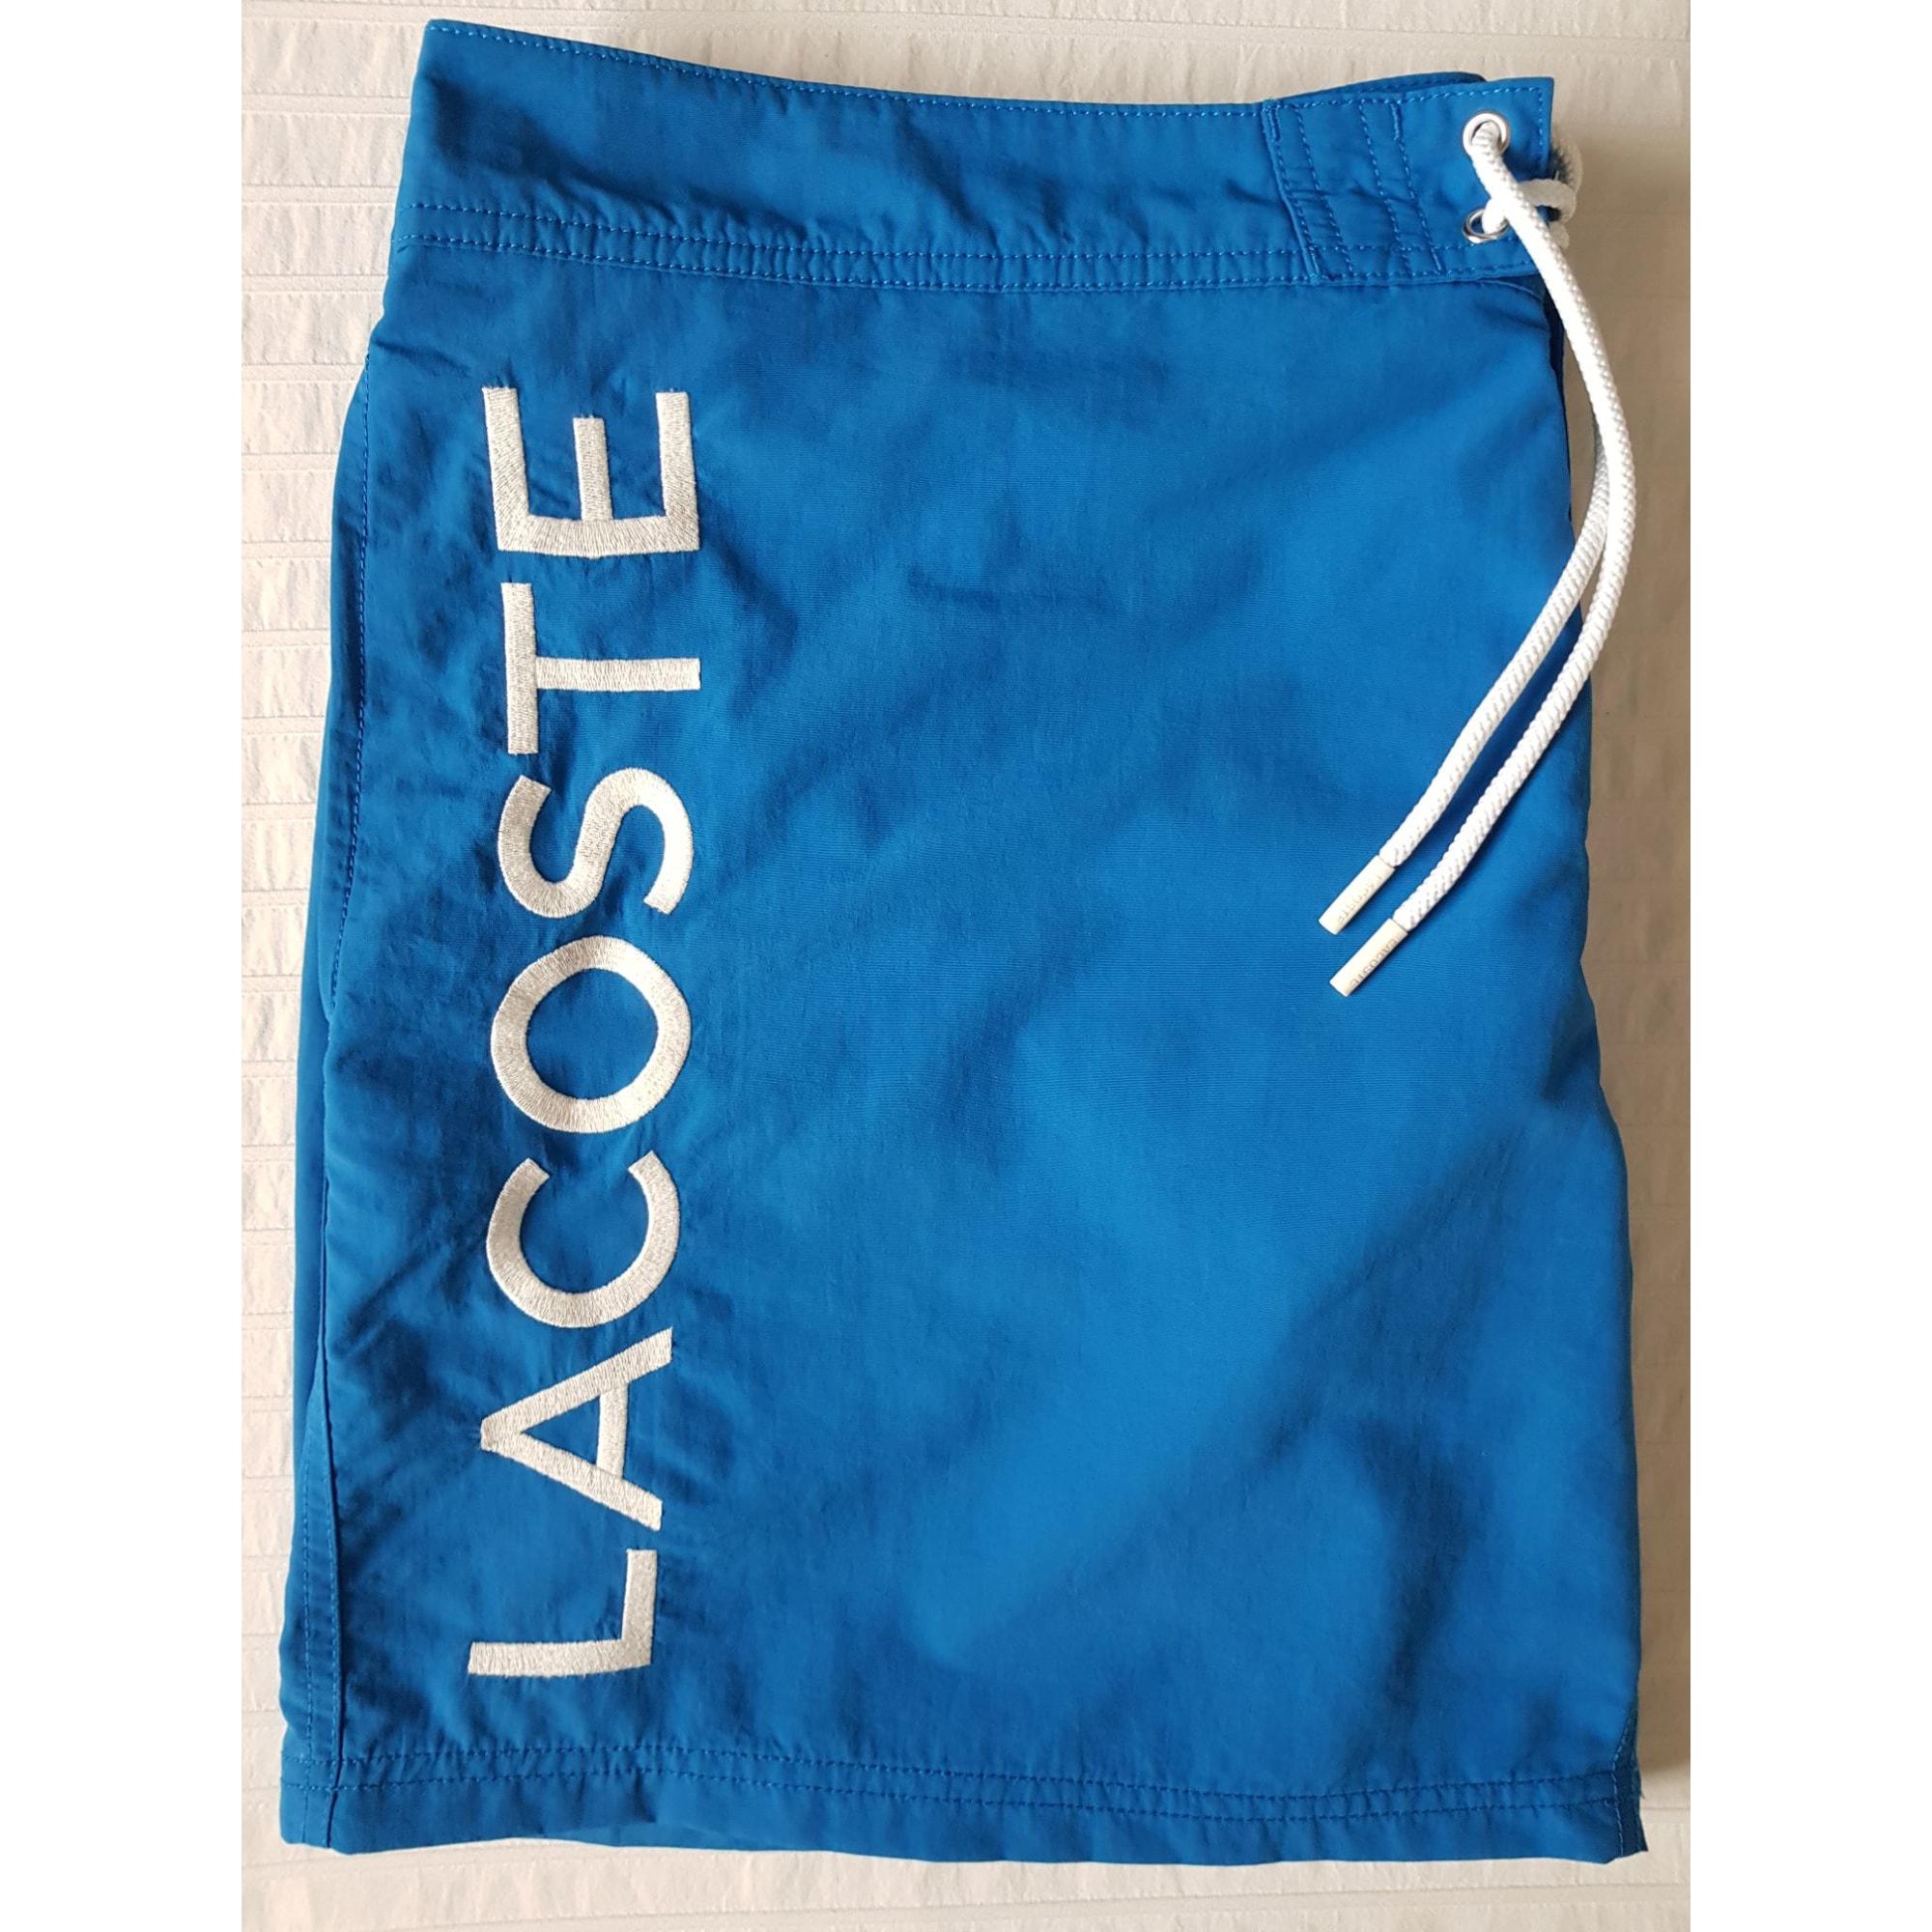 Short de bain LACOSTE Bleu, bleu marine, bleu turquoise